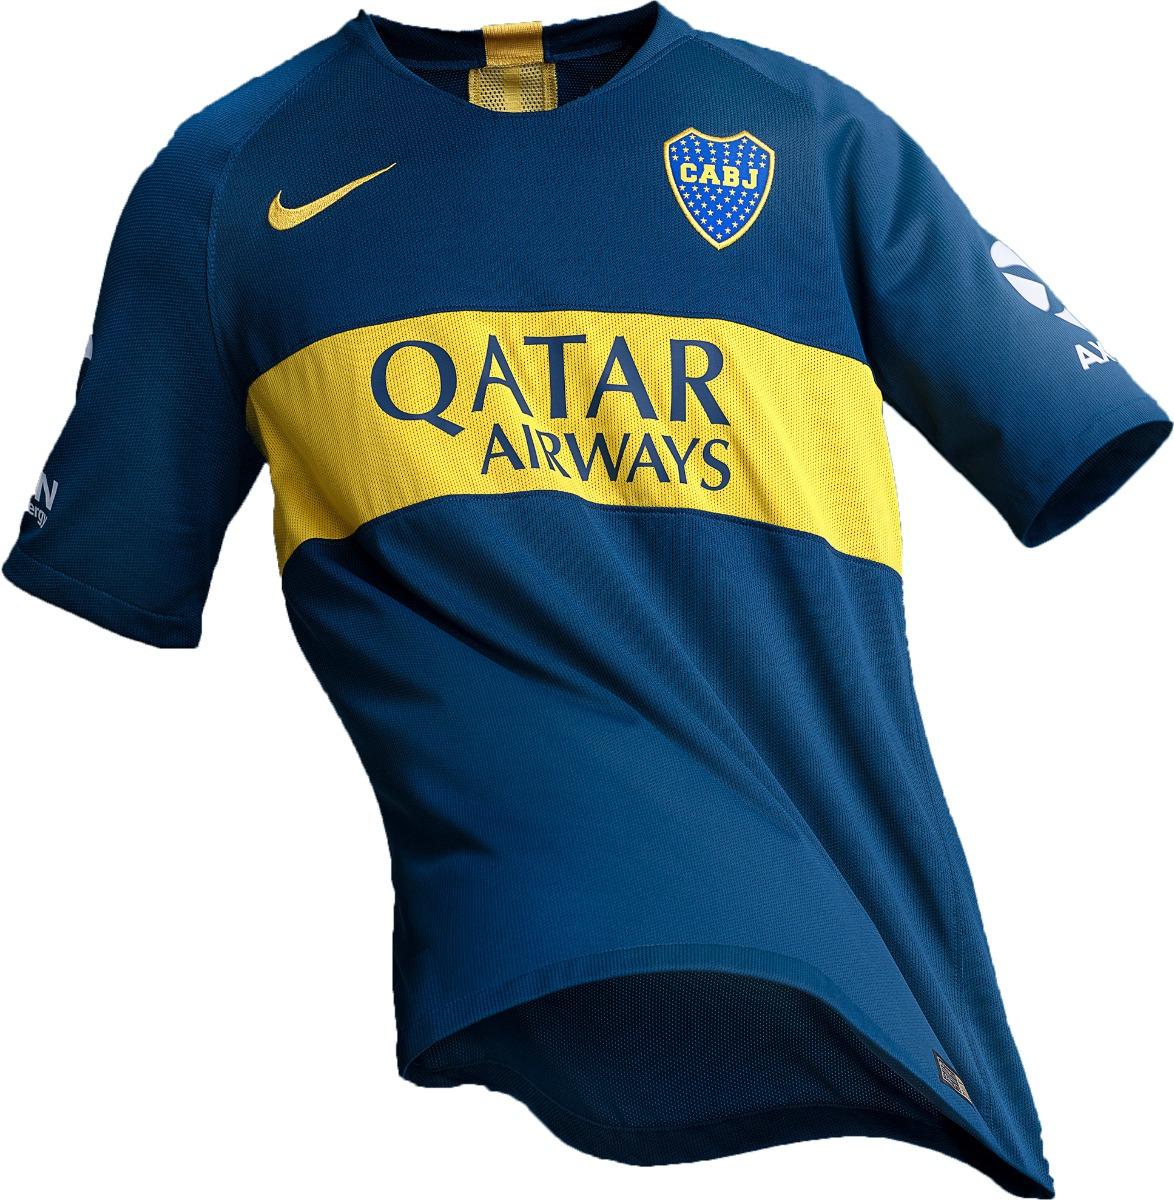 75cd30665dacd camisetas boca juniors titular + alternativa 2019 palermo. Cargando zoom.